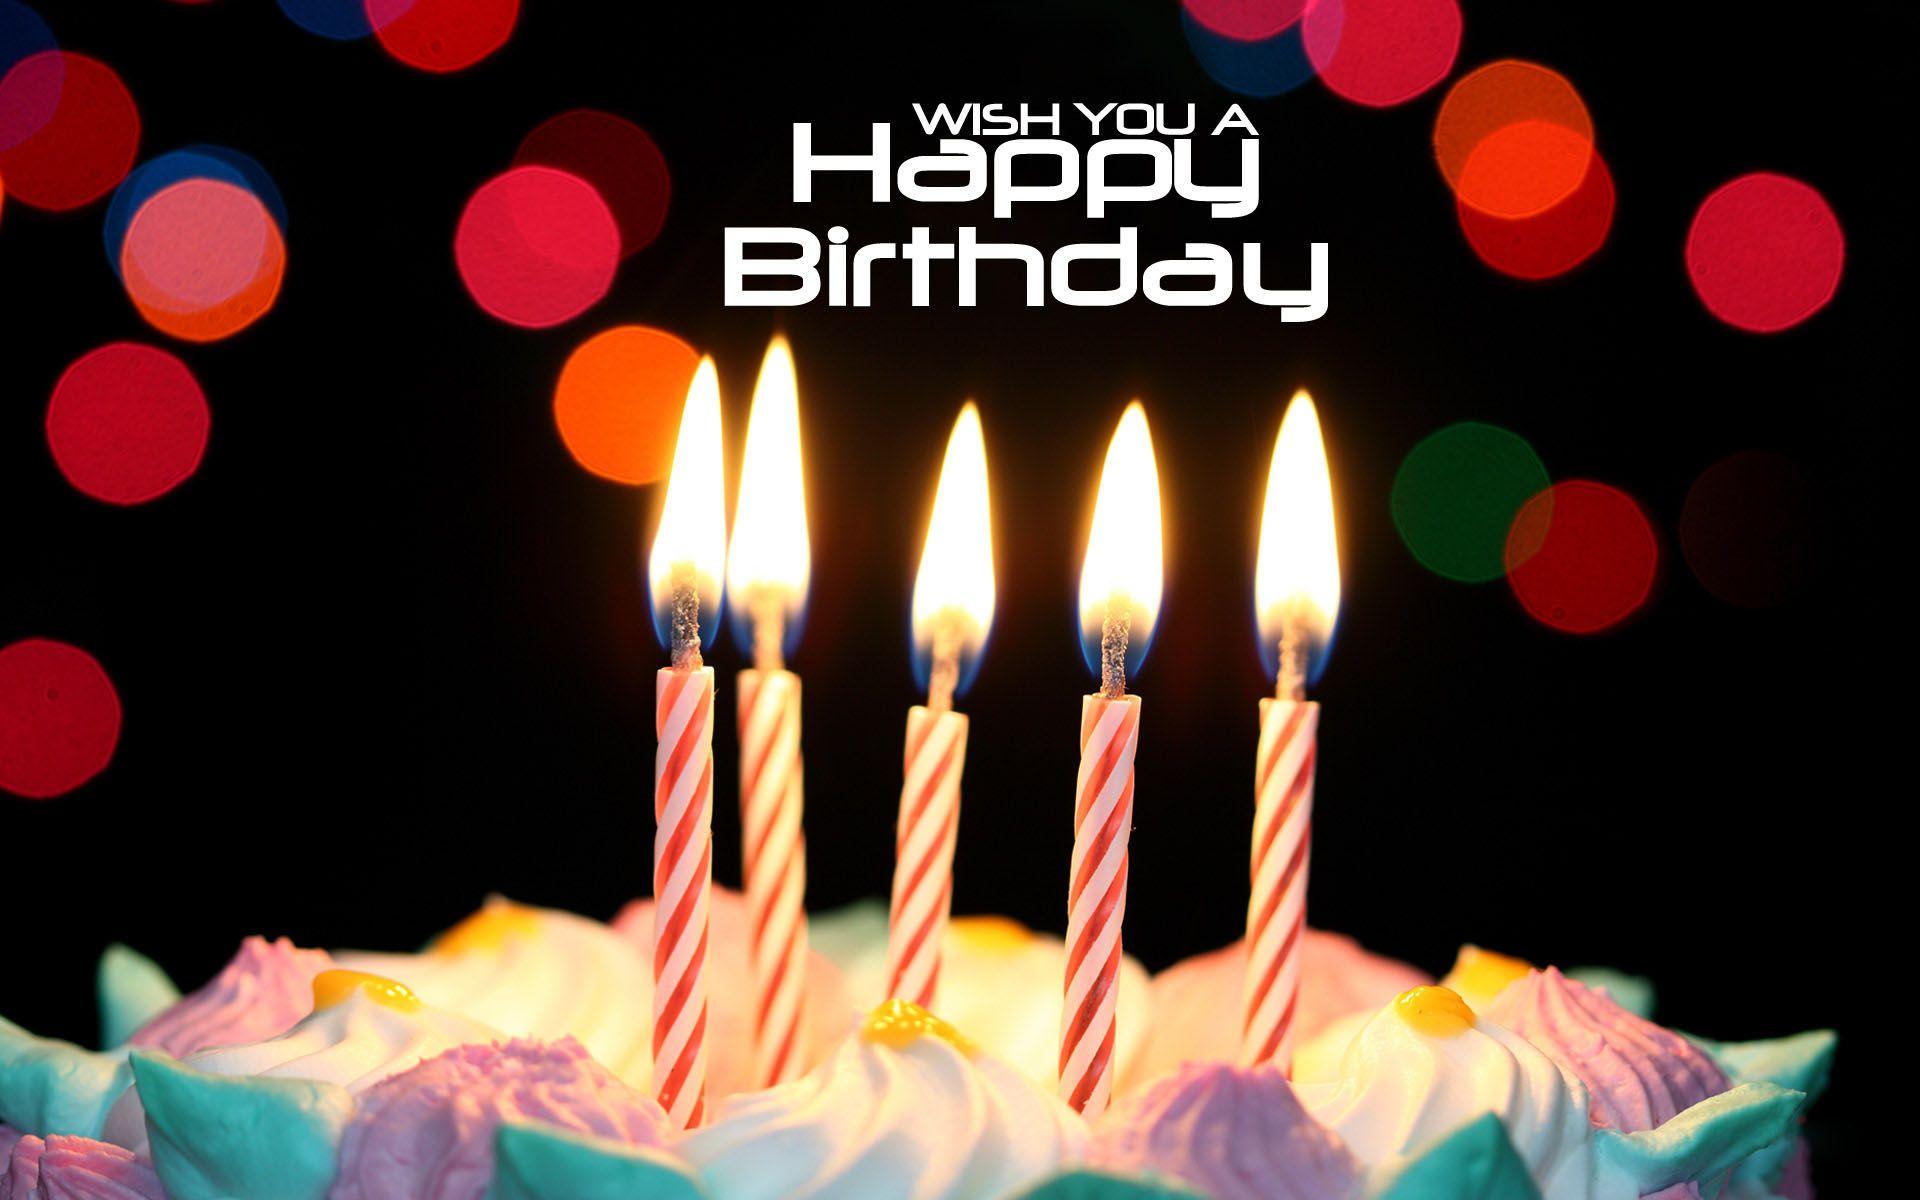 Wish you a happy birthday happy birthday happy birthday wishes happy